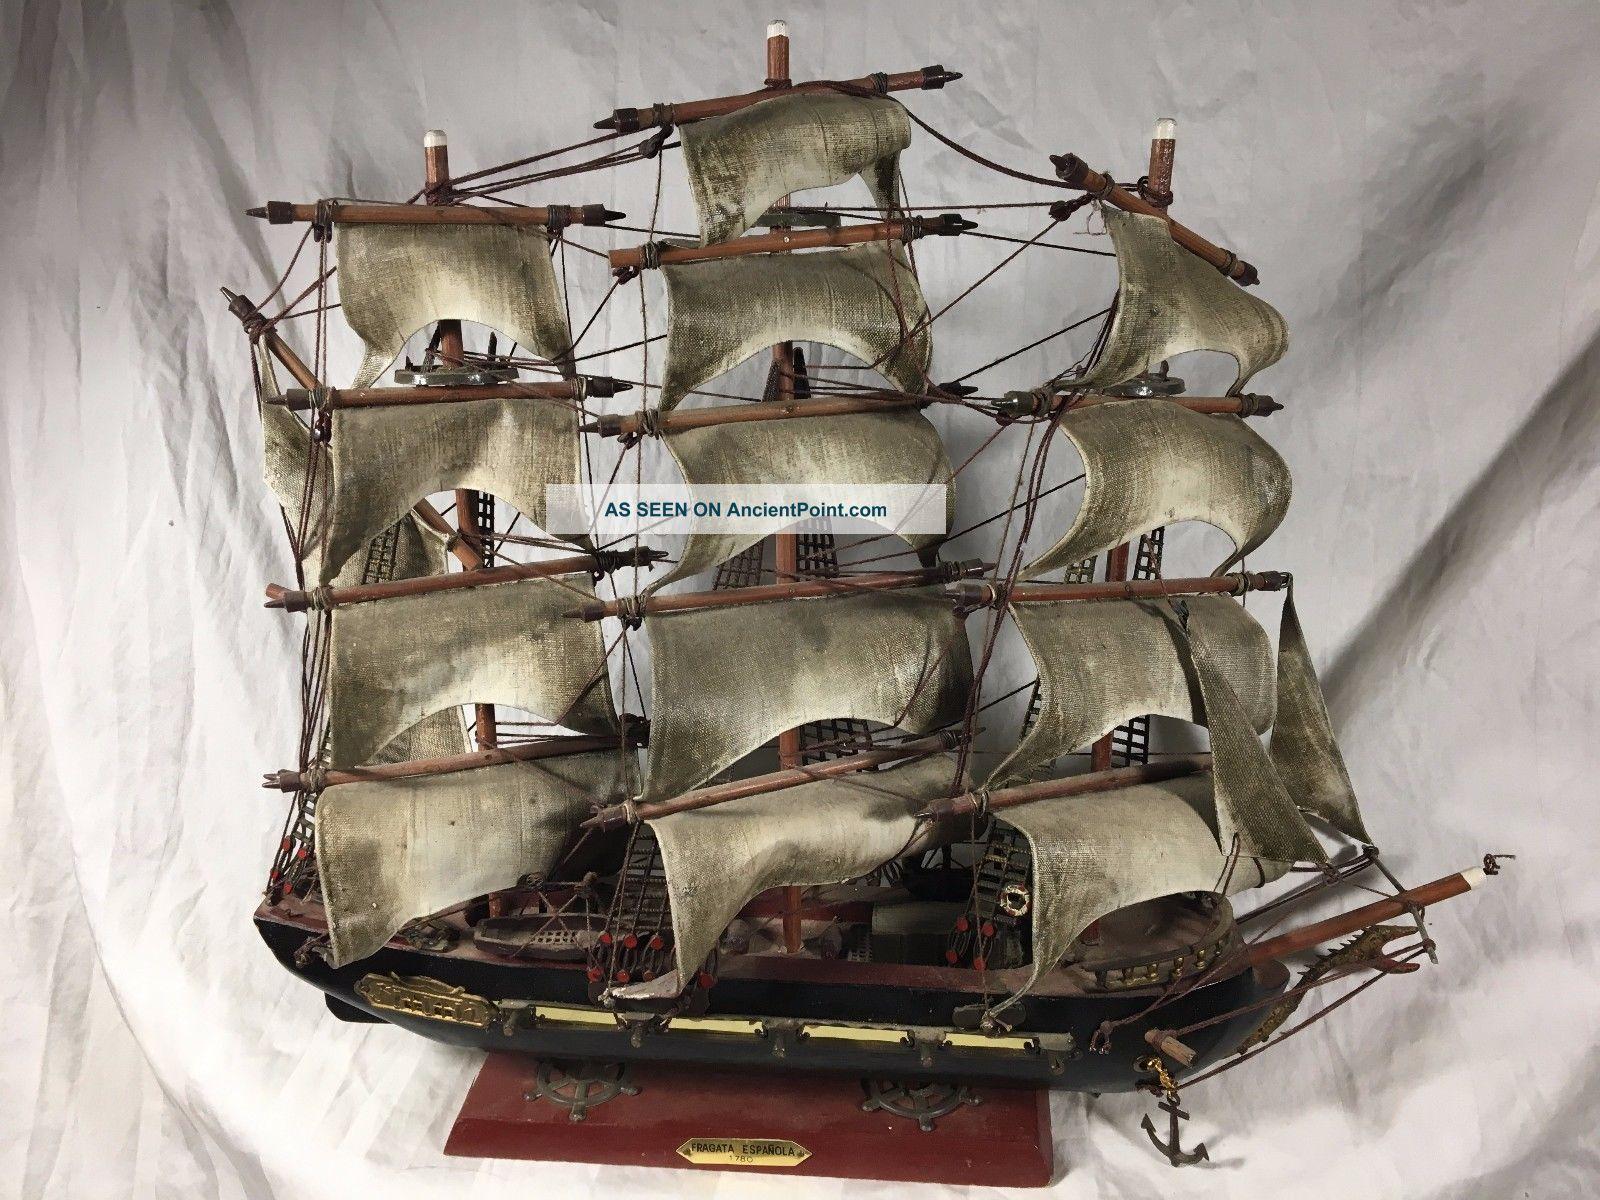 Fragata Espanola 1780 Maritime Model Ship Sailing Vessel Large 16